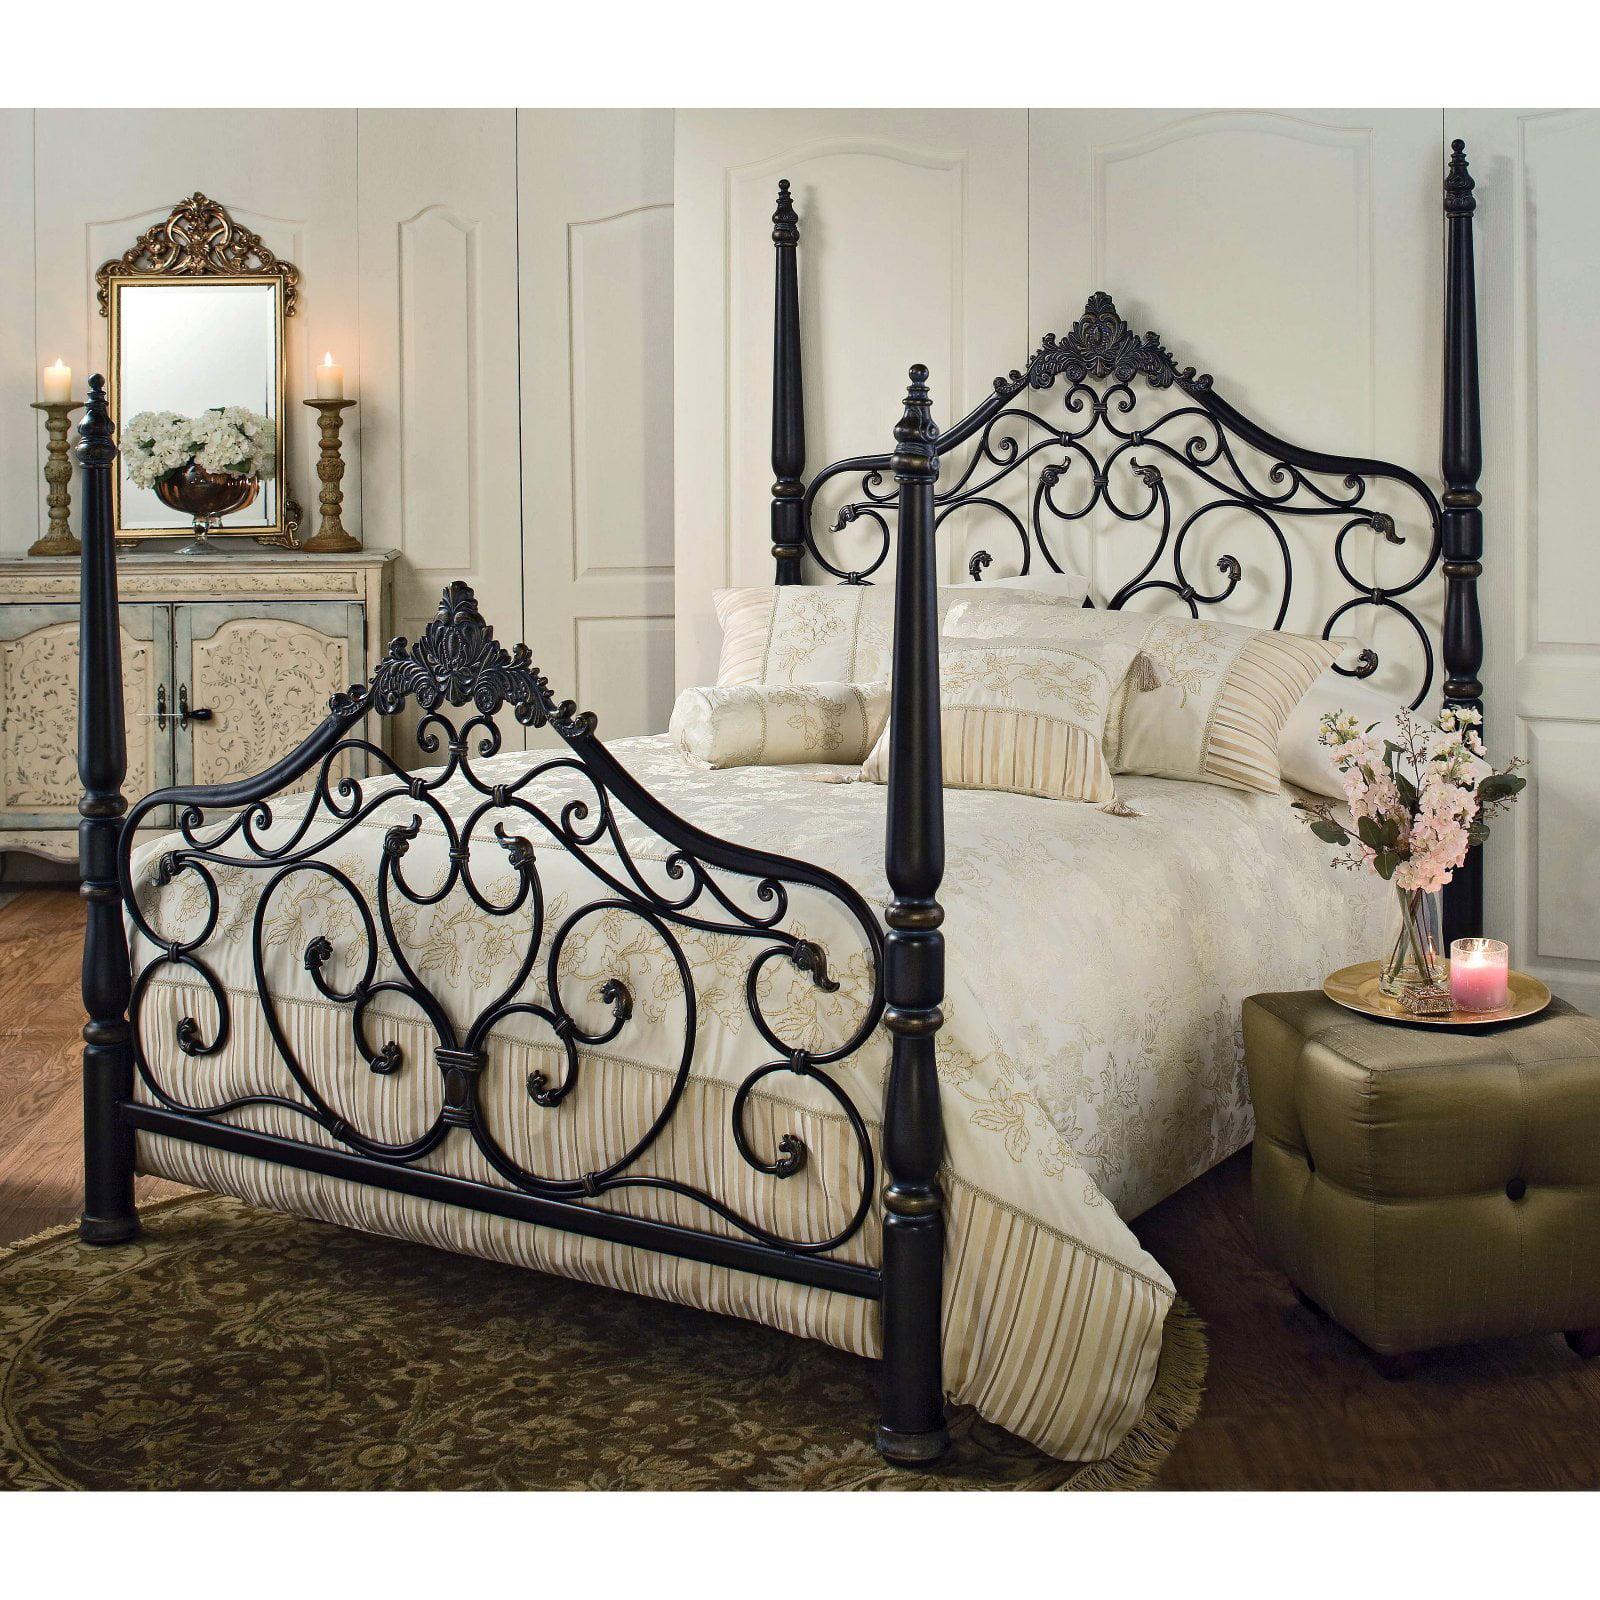 Hillsdale Parkwood Poster Bed by Hillsdale Furniture LLC